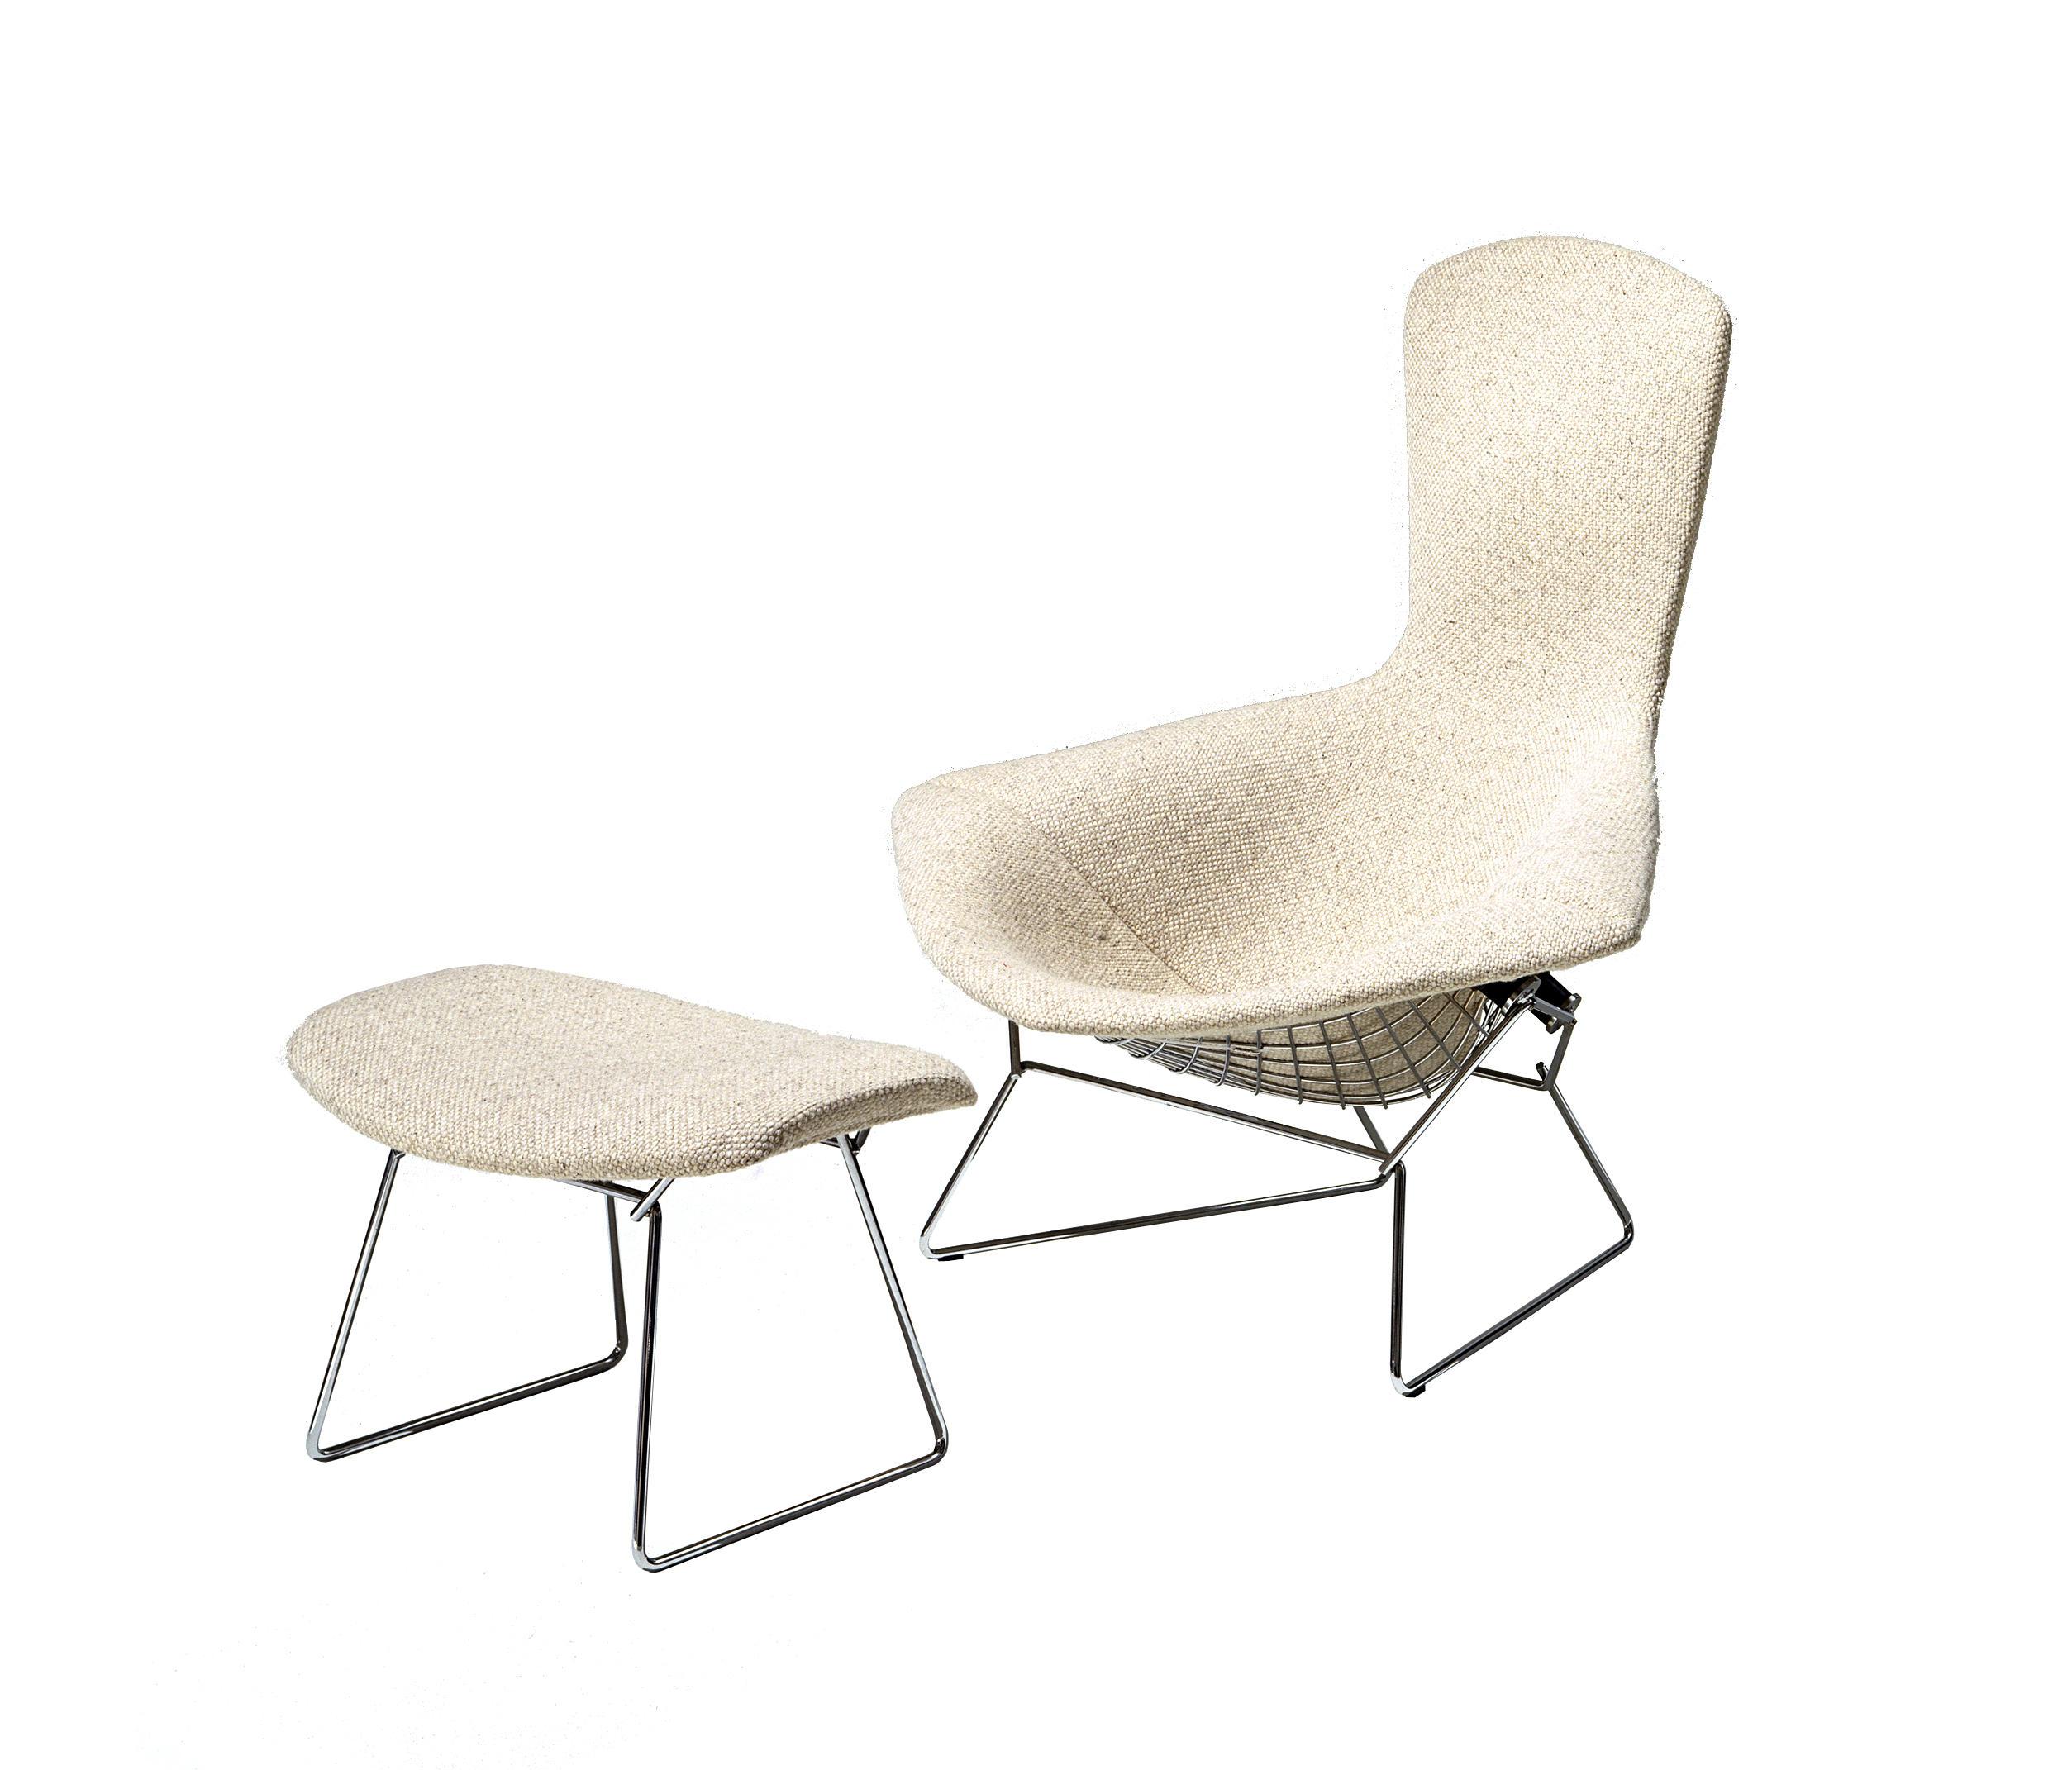 Bertoia fauteuil haut dossier et pouf fauteuils de knoll international ar - Fauteuil bertoia knoll ...